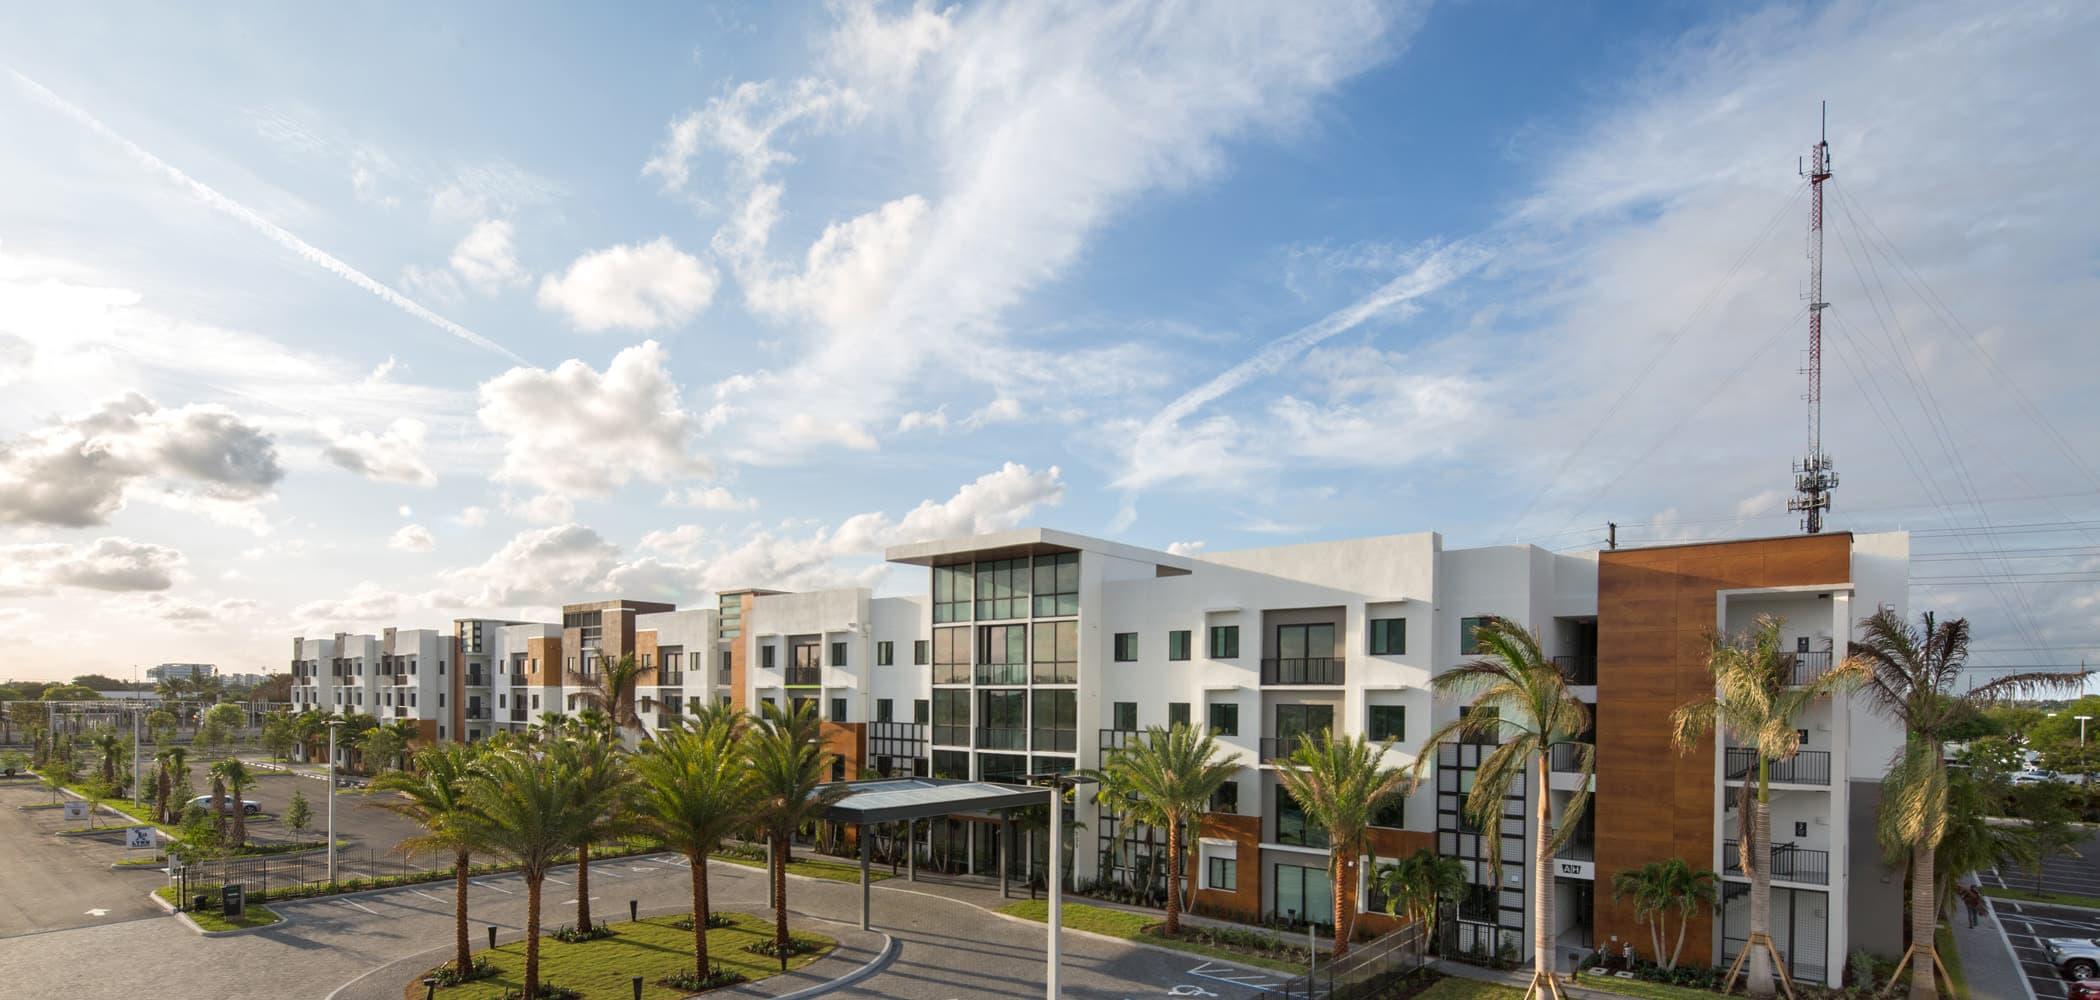 Exterior aerial view of University Park in Boca Raton, Florida